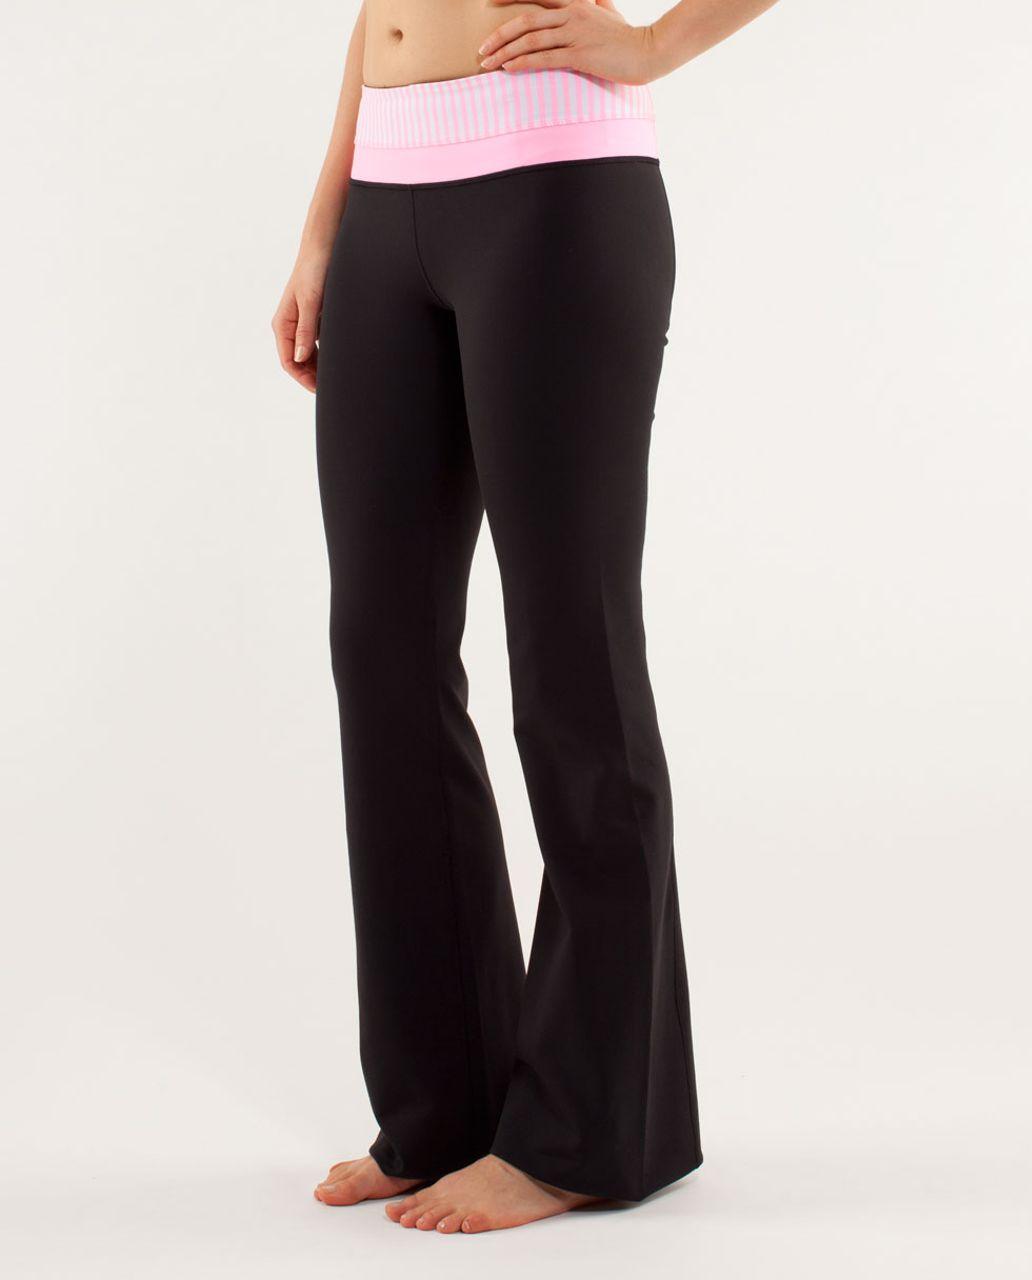 Lululemon Groove Pant *New (Regular) - Black / Classic Stripe White Pink Shell / Pink Shell